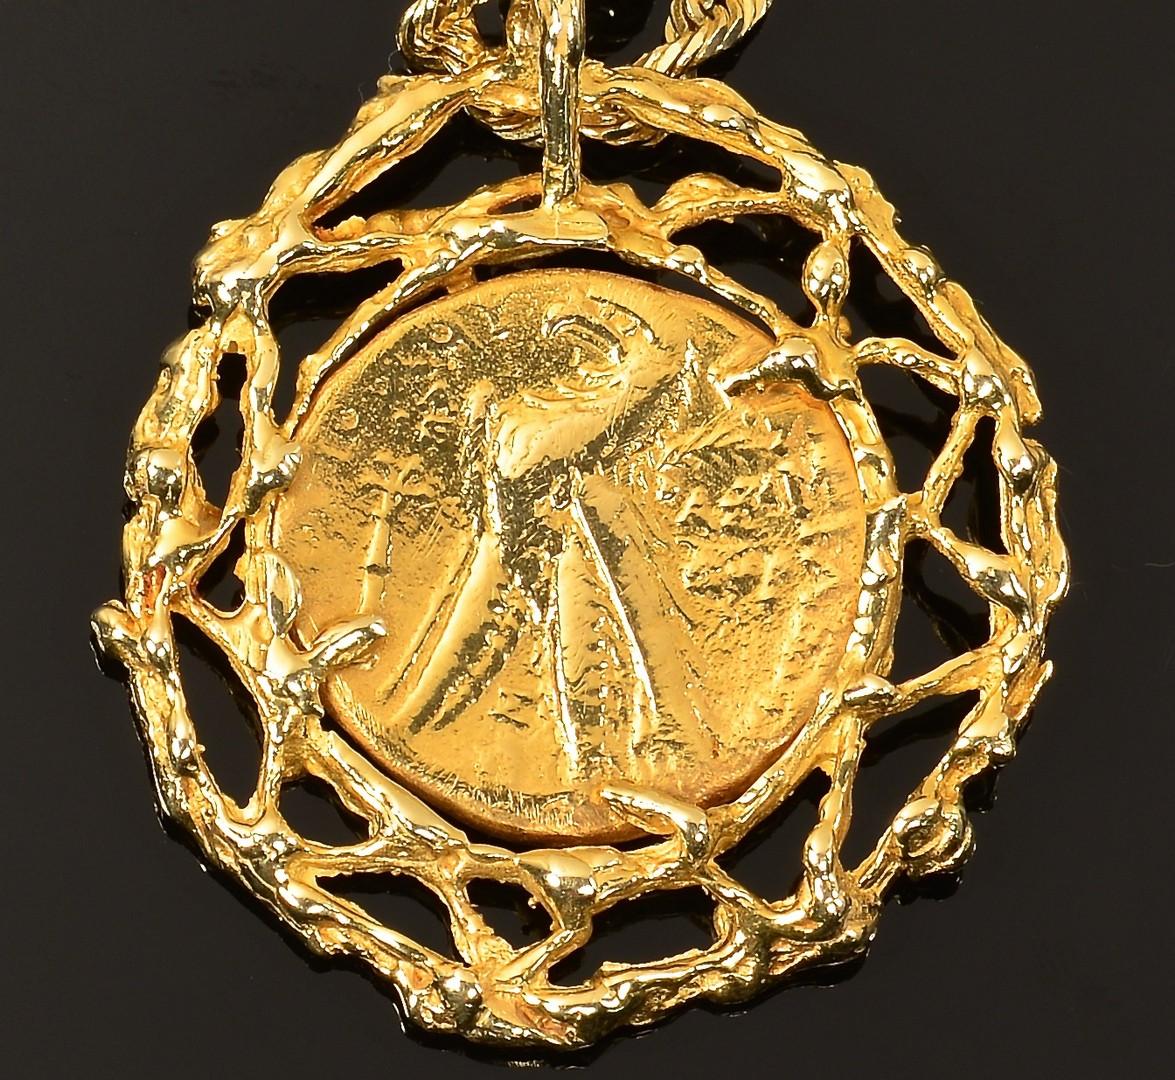 Lot 78: 14K Roman-style Coin Pendant Necklace